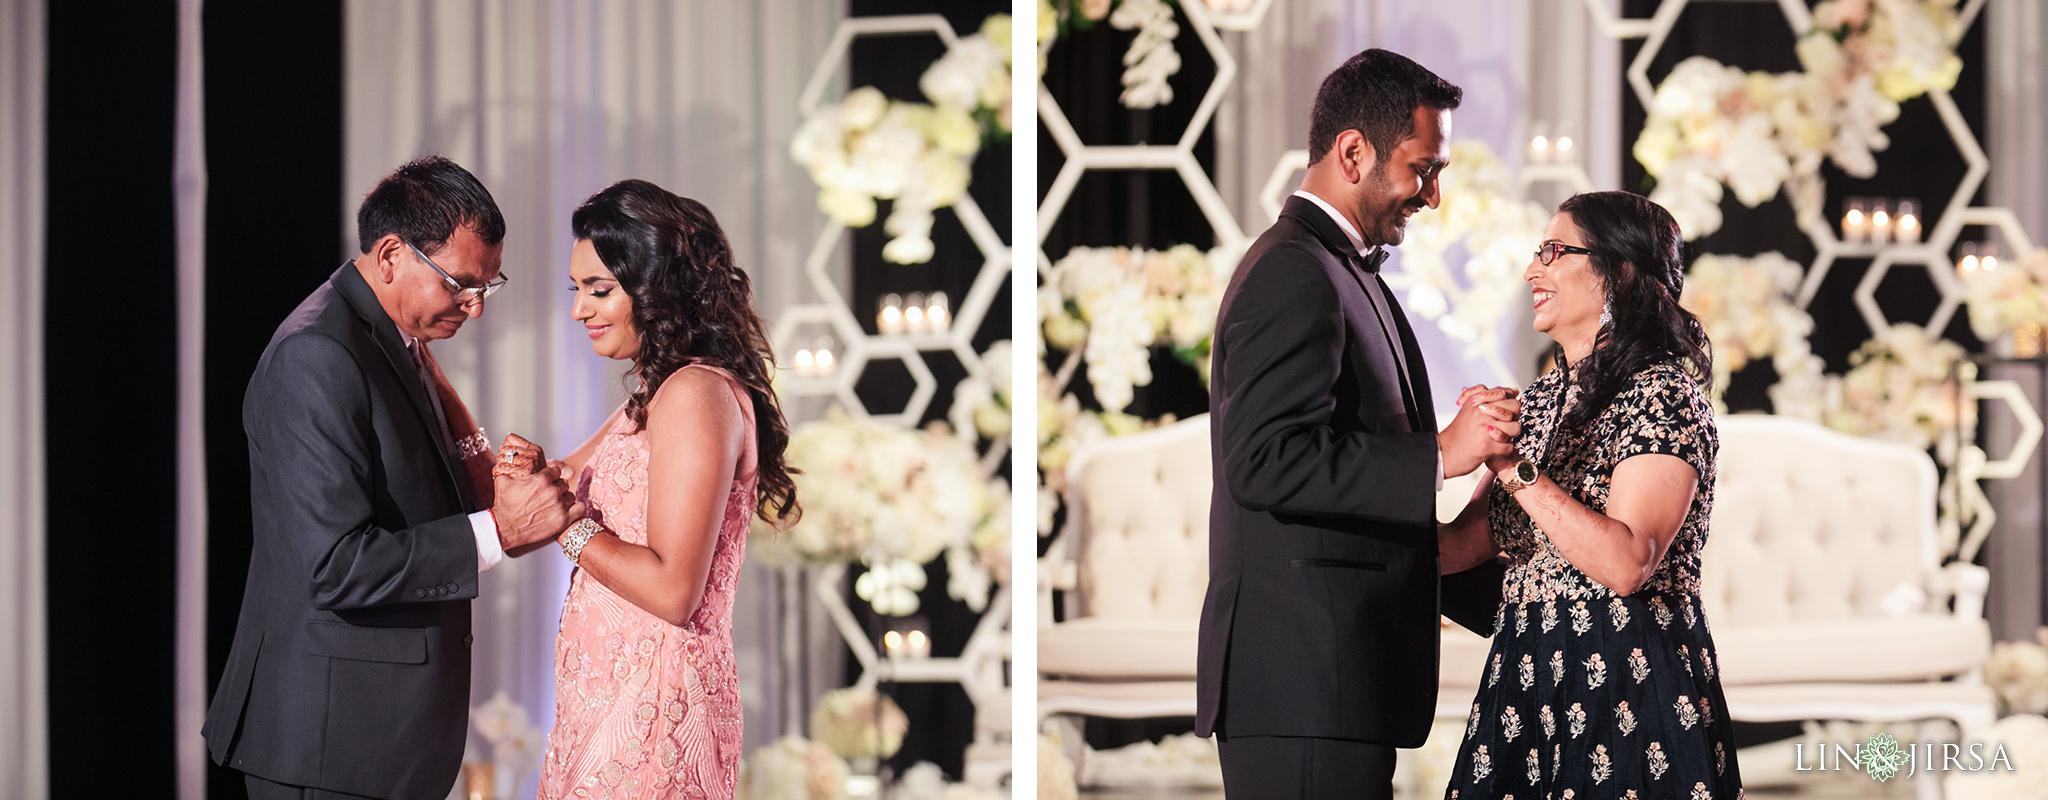 38 Hilton Santa Barbara Indian Wedding Photography